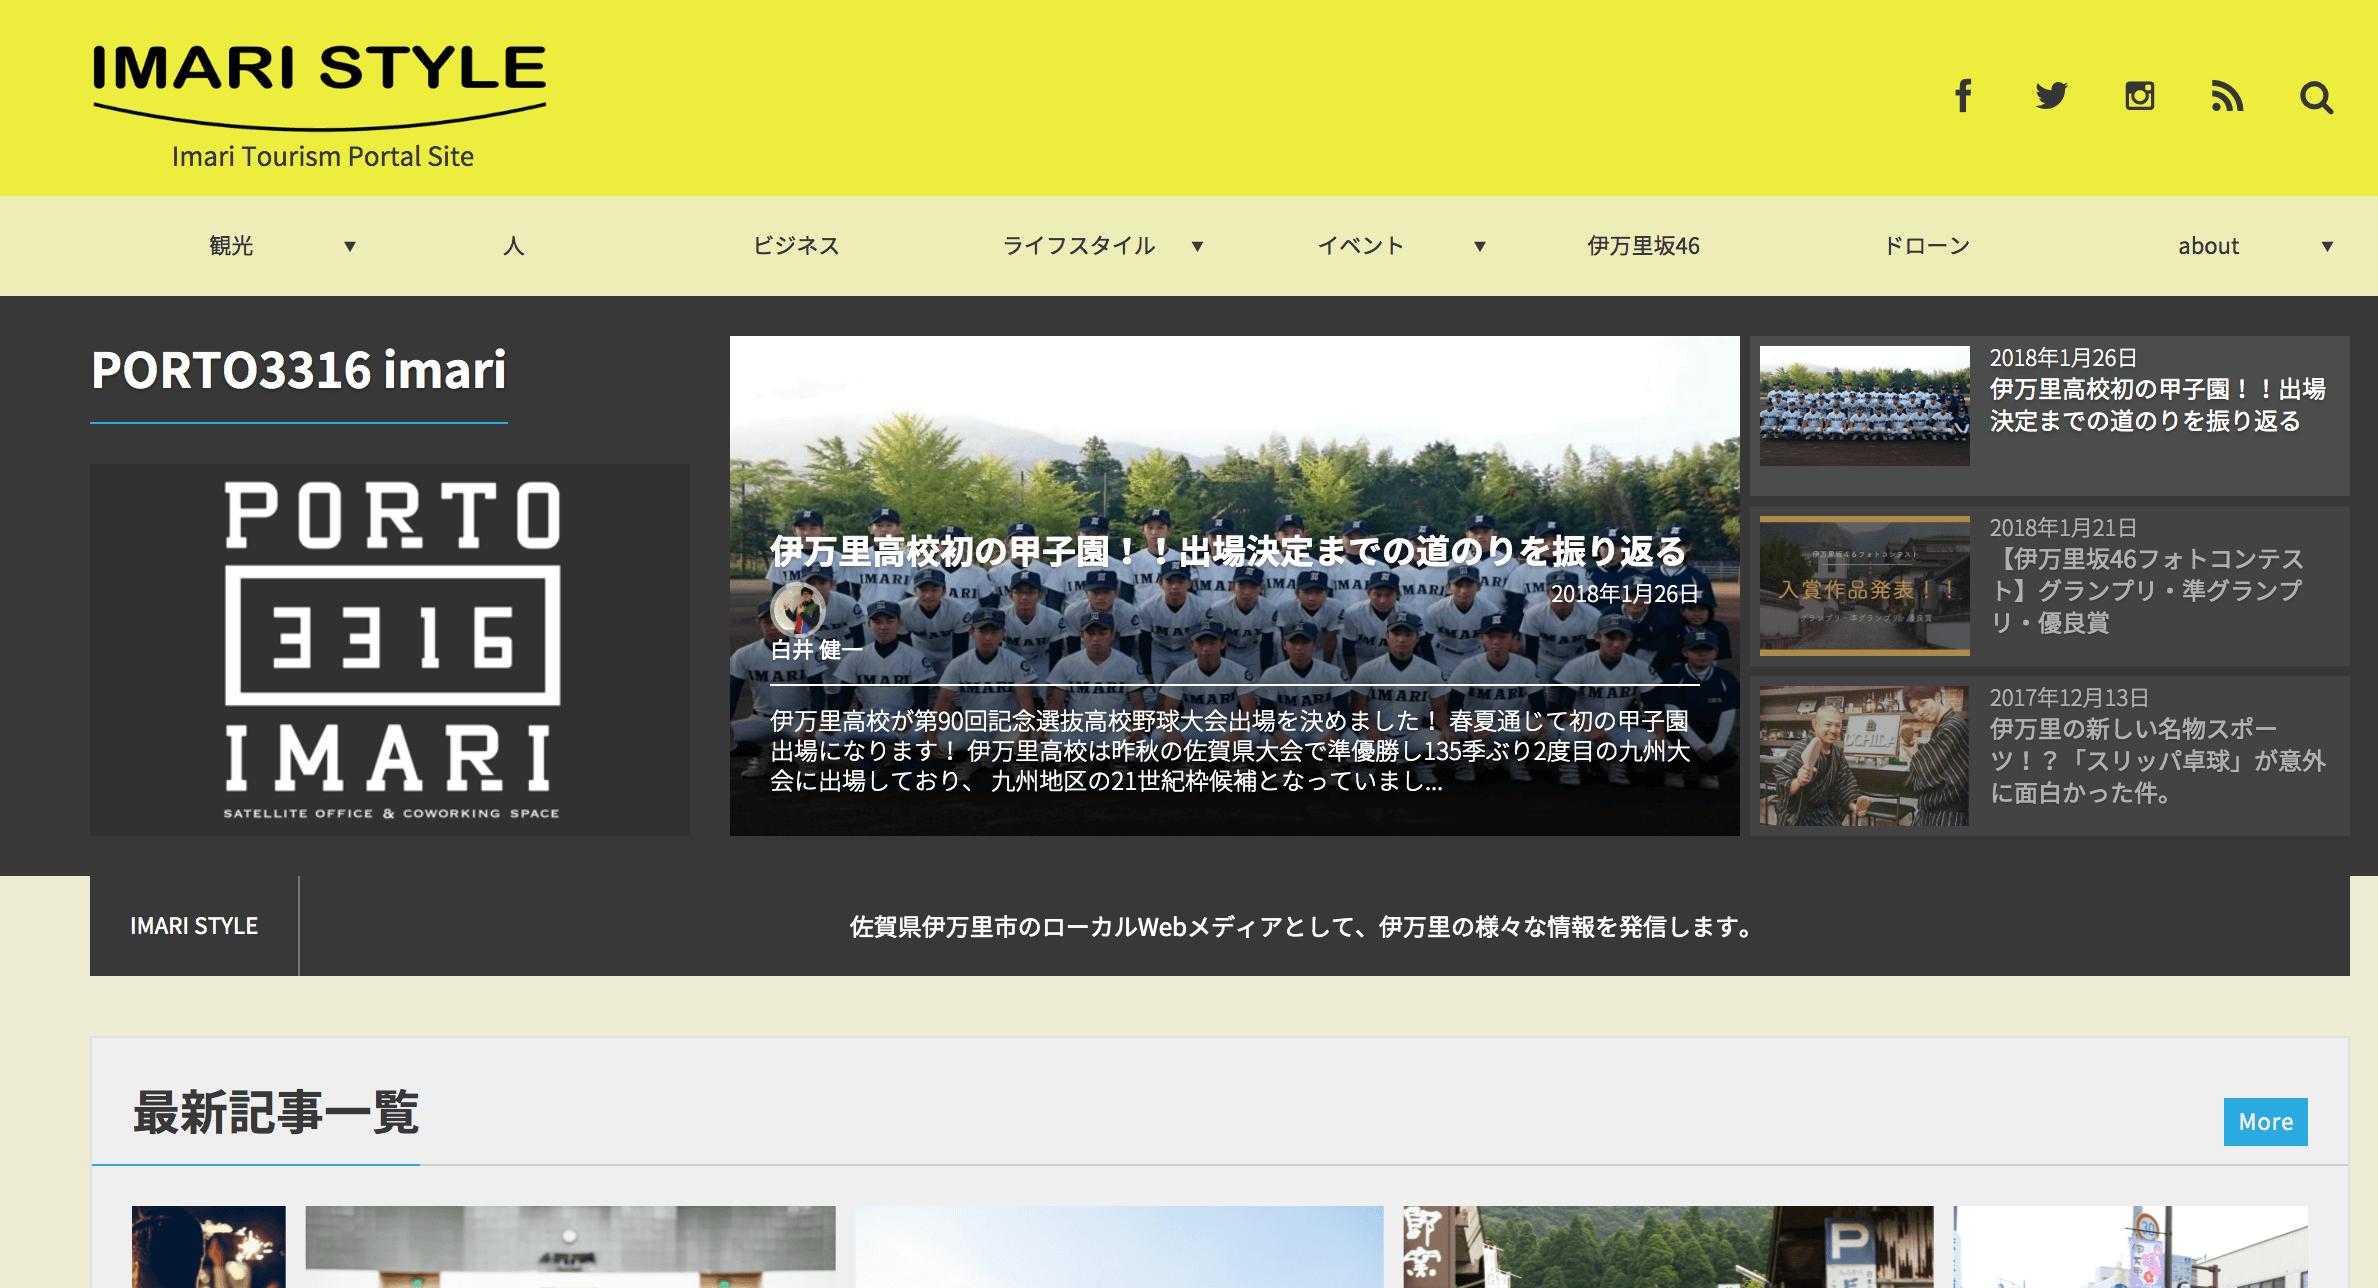 IMARI STYLE ポータルサイト